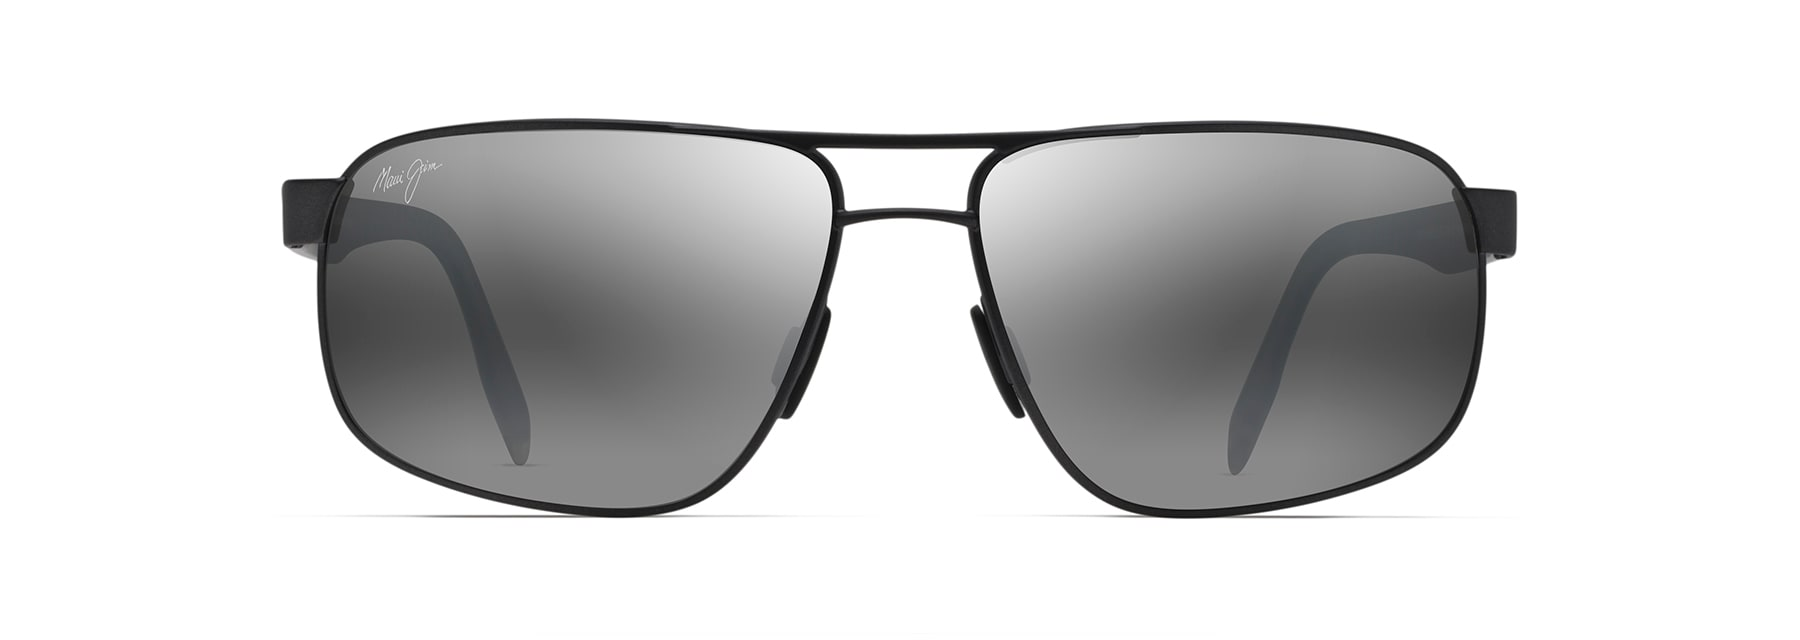 whitehaven polarized sunglasses maui jim®